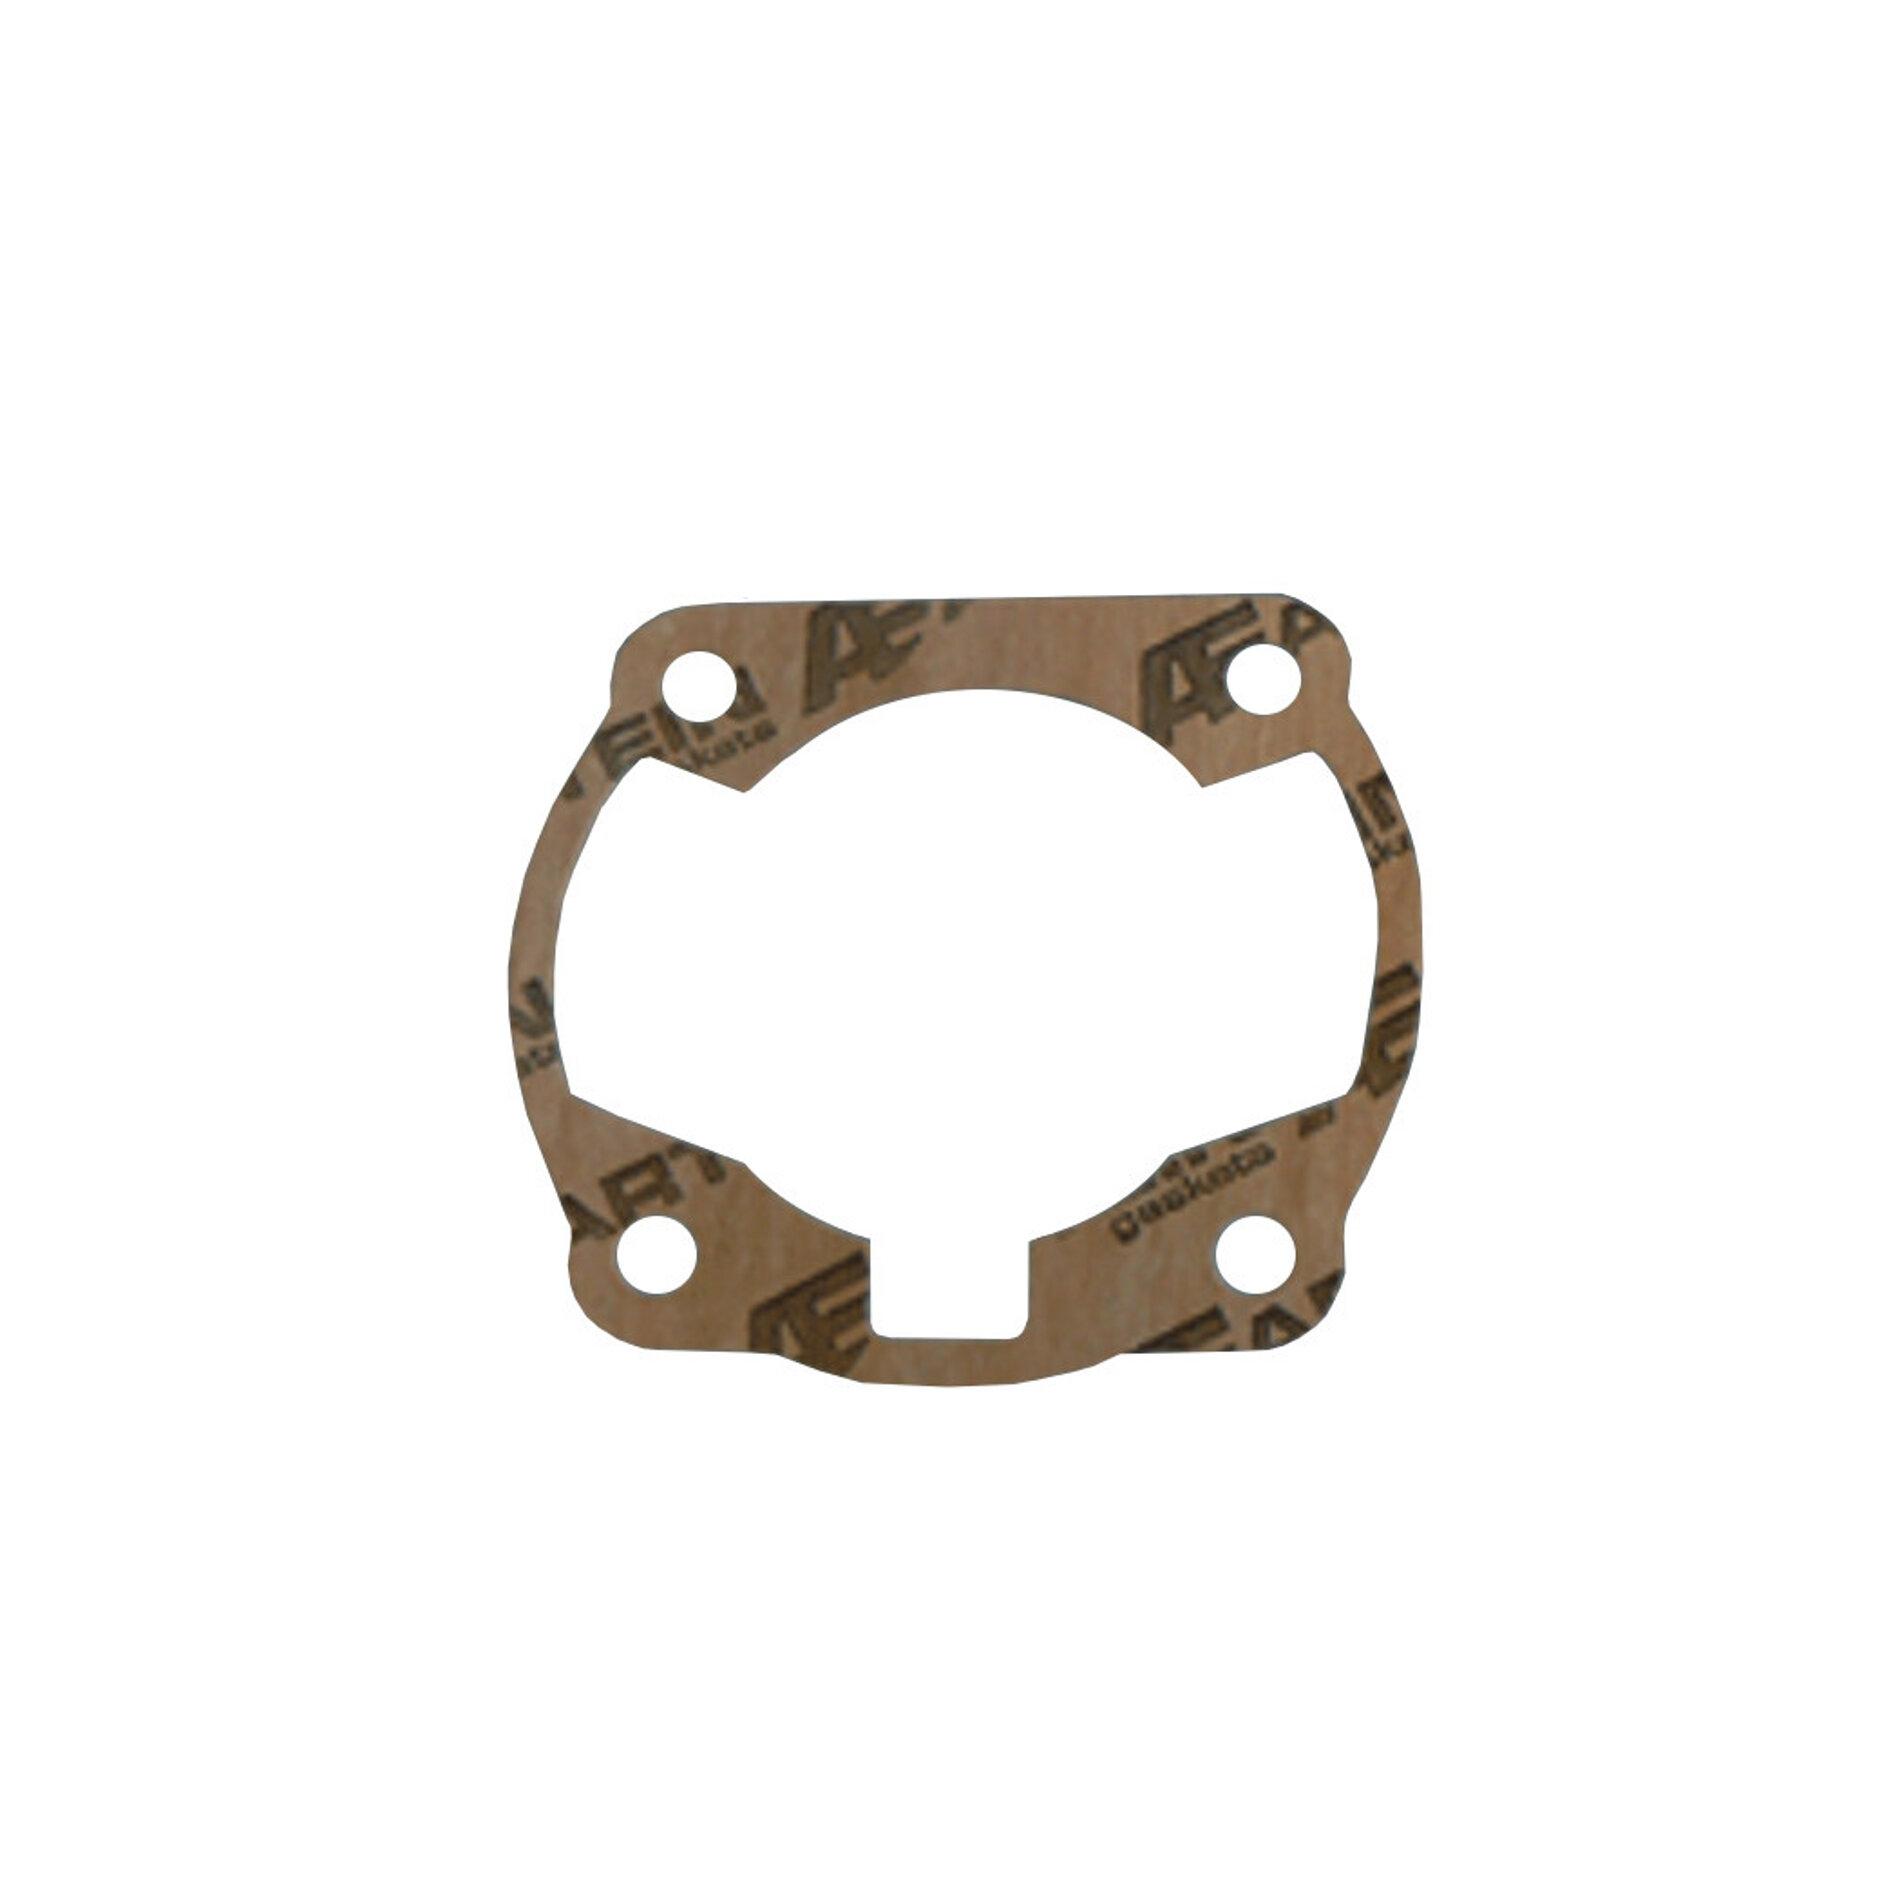 Joint d'embase Aluminium Bidalot 0,20 Derbi Euro 2